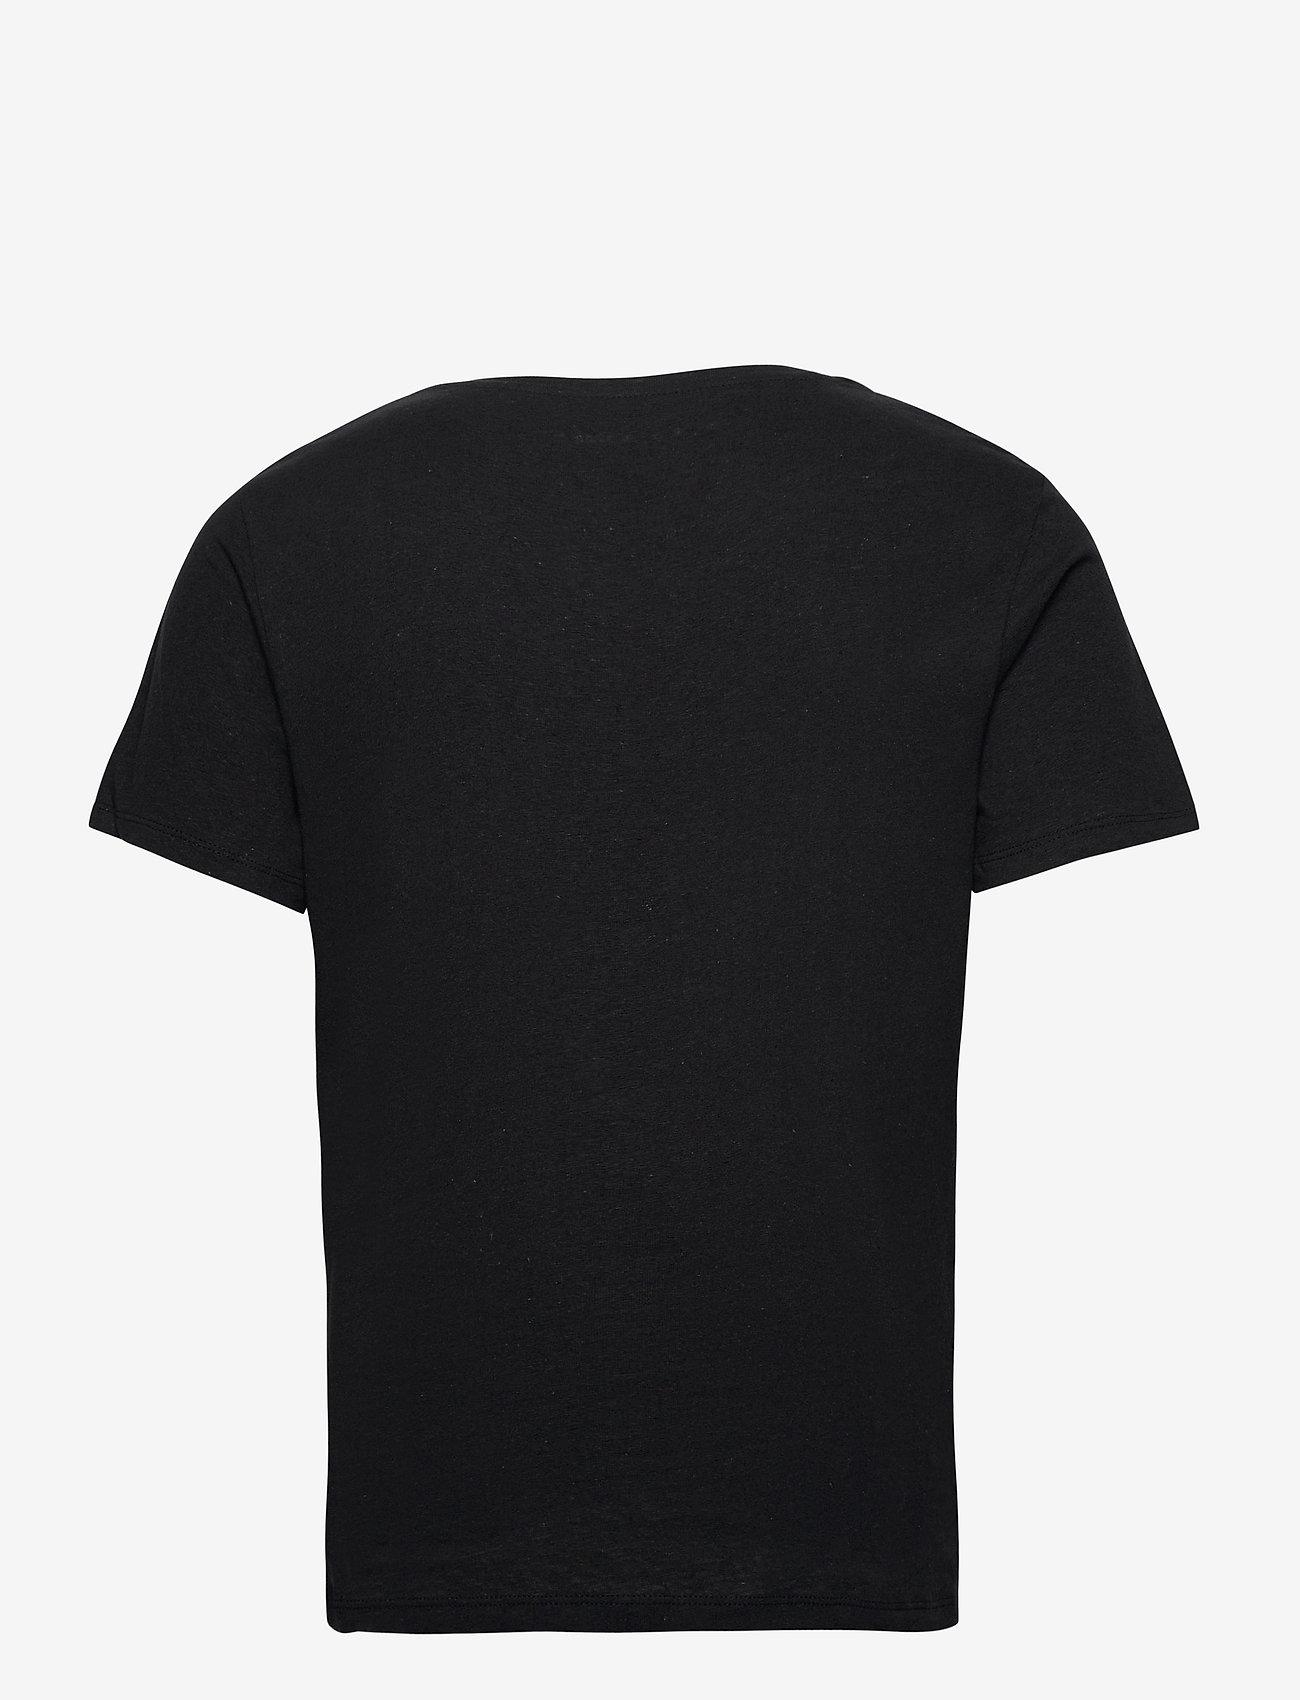 Jack & Jones - JJELINEN BASIC TEE SS CREW NECK STS - basic t-shirts - black - 1